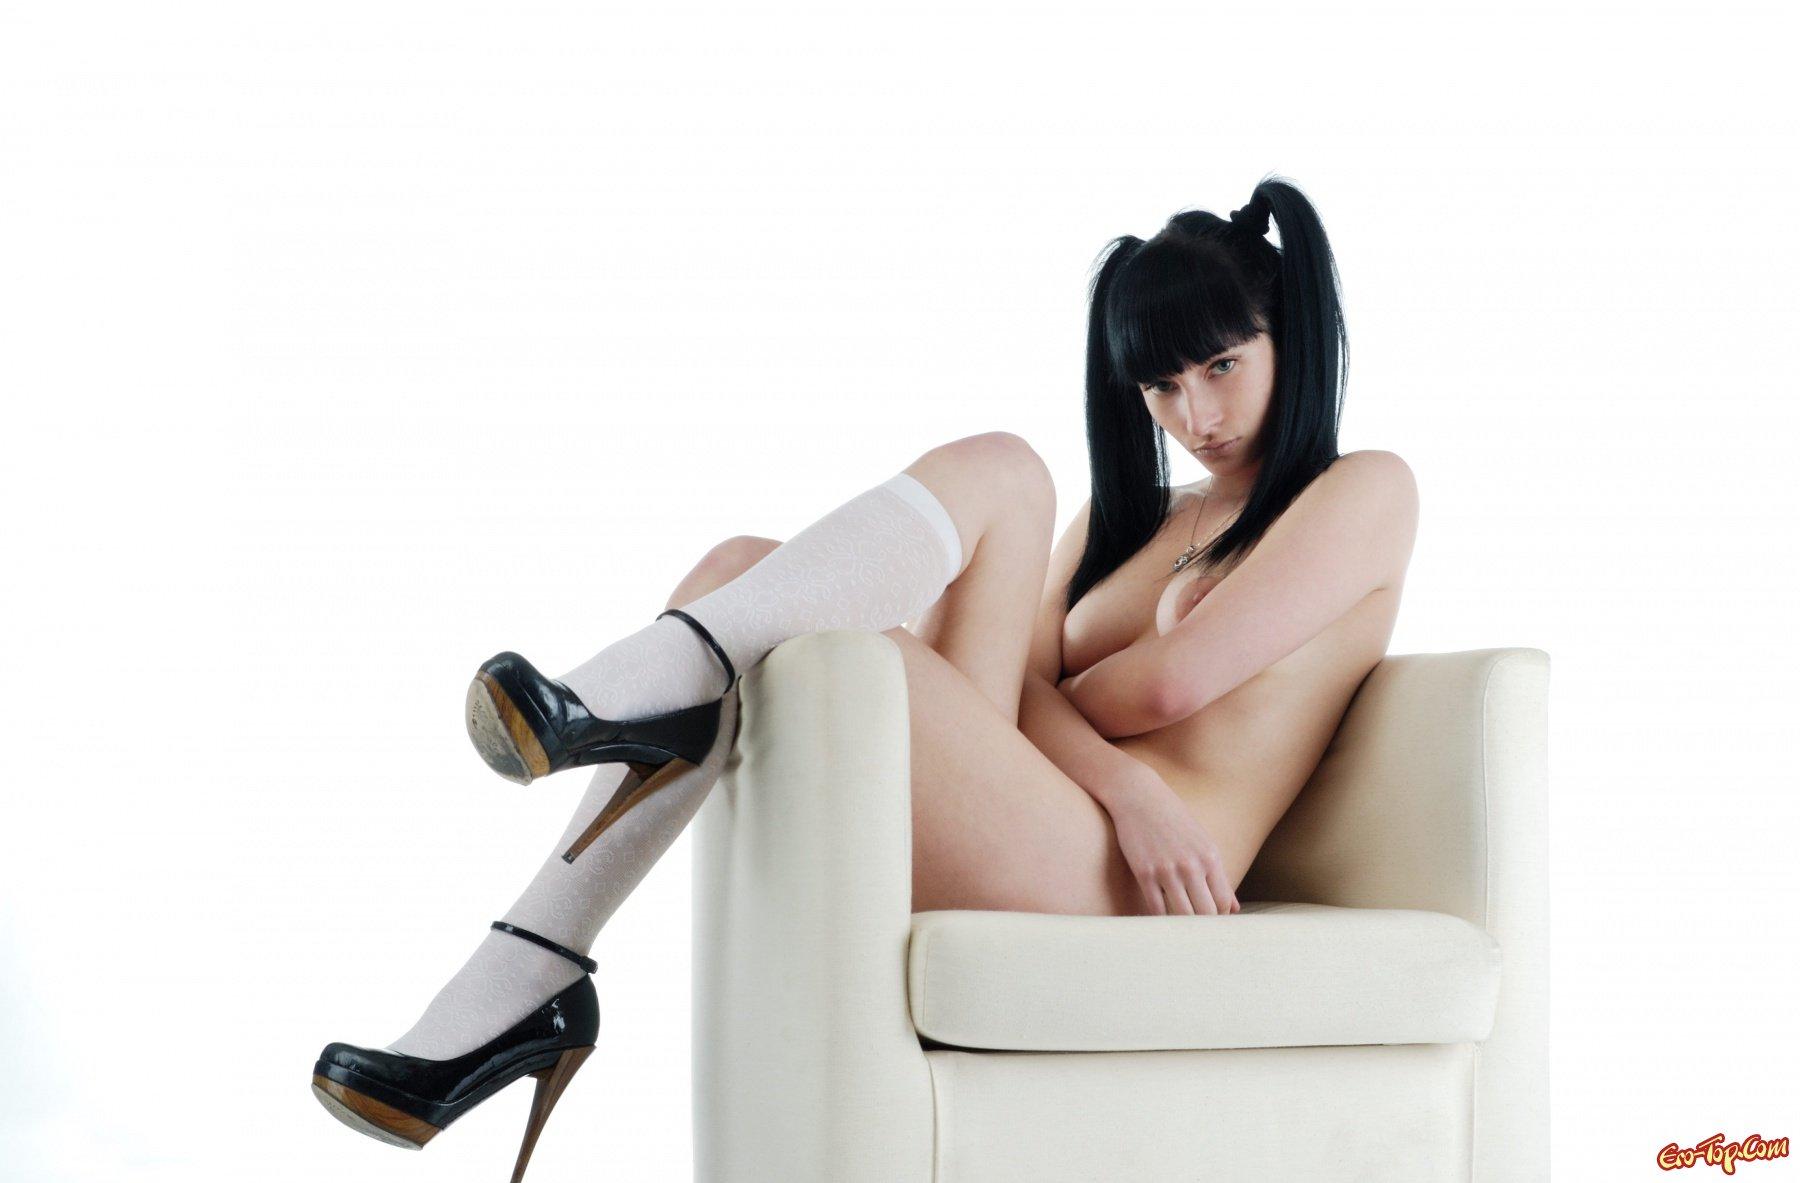 обнаженный секс картинки